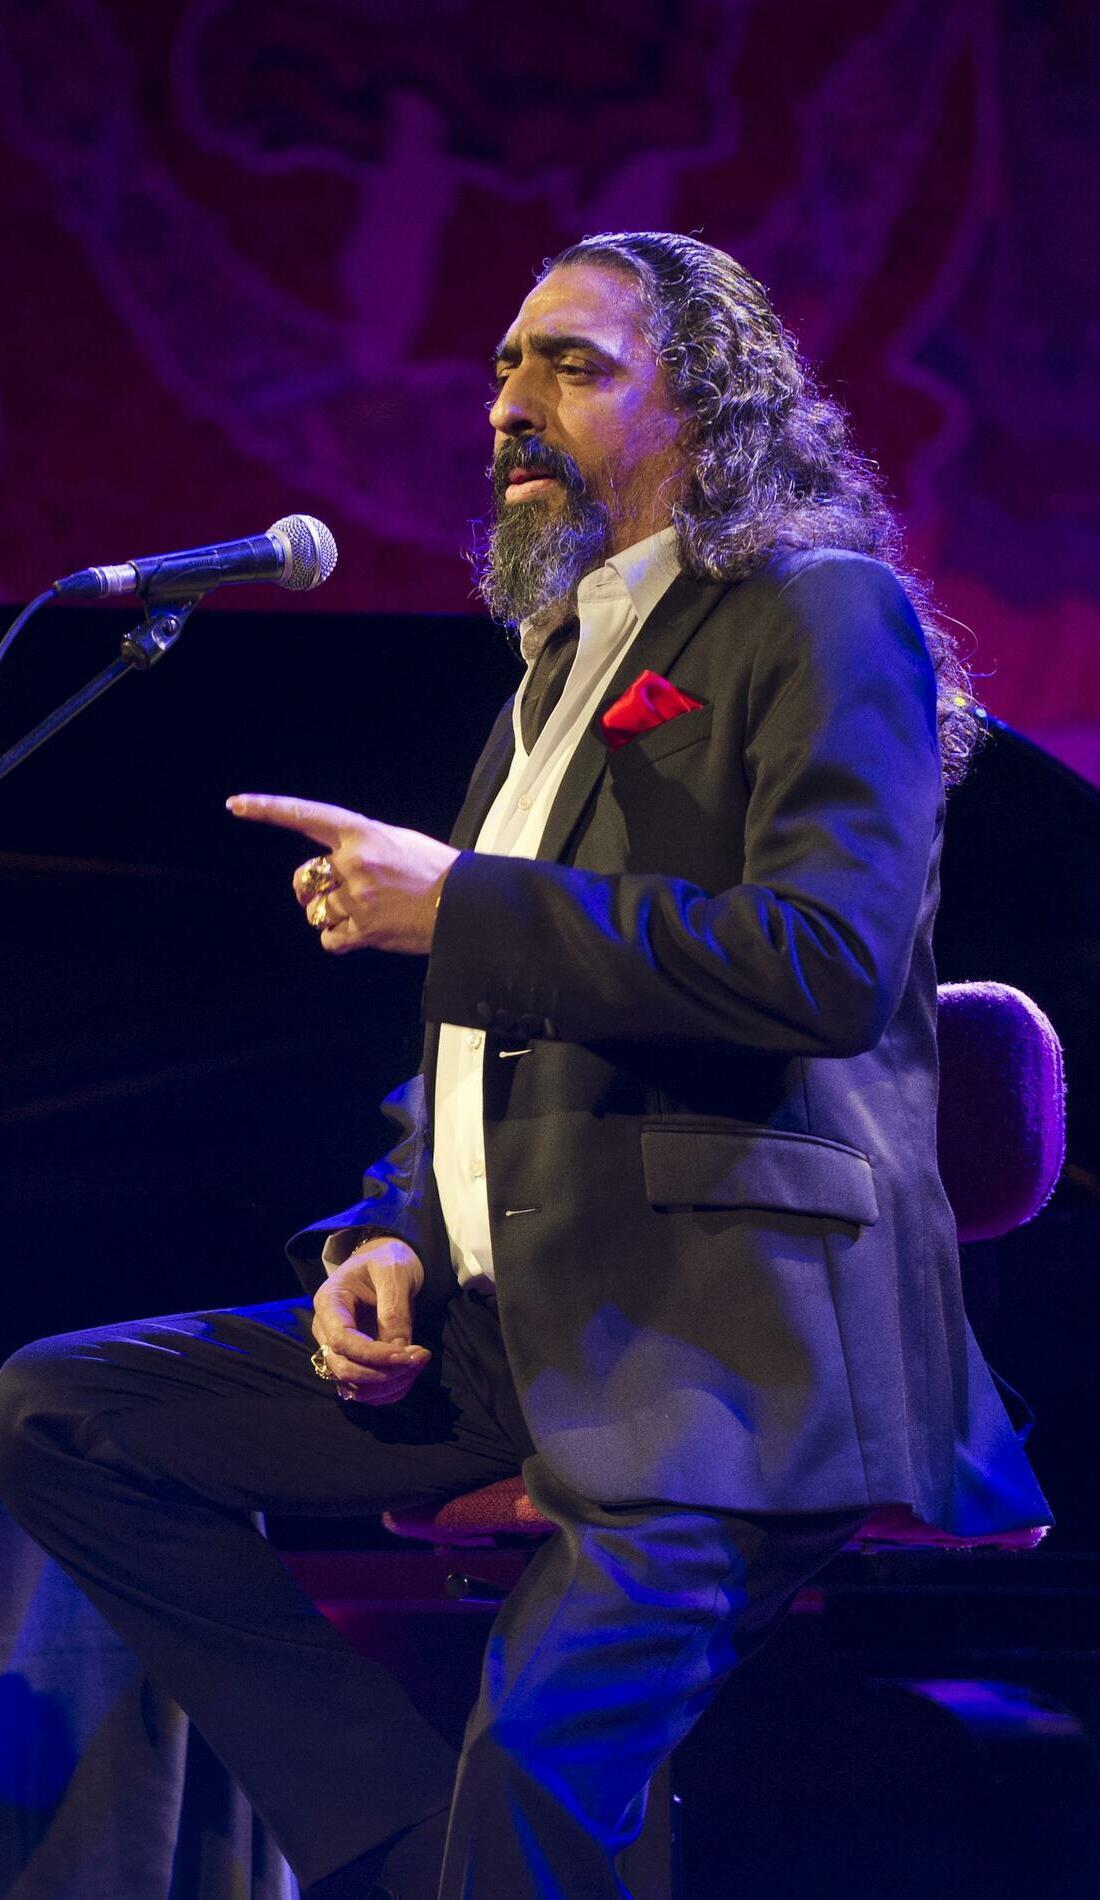 A Diego El Cigala live event